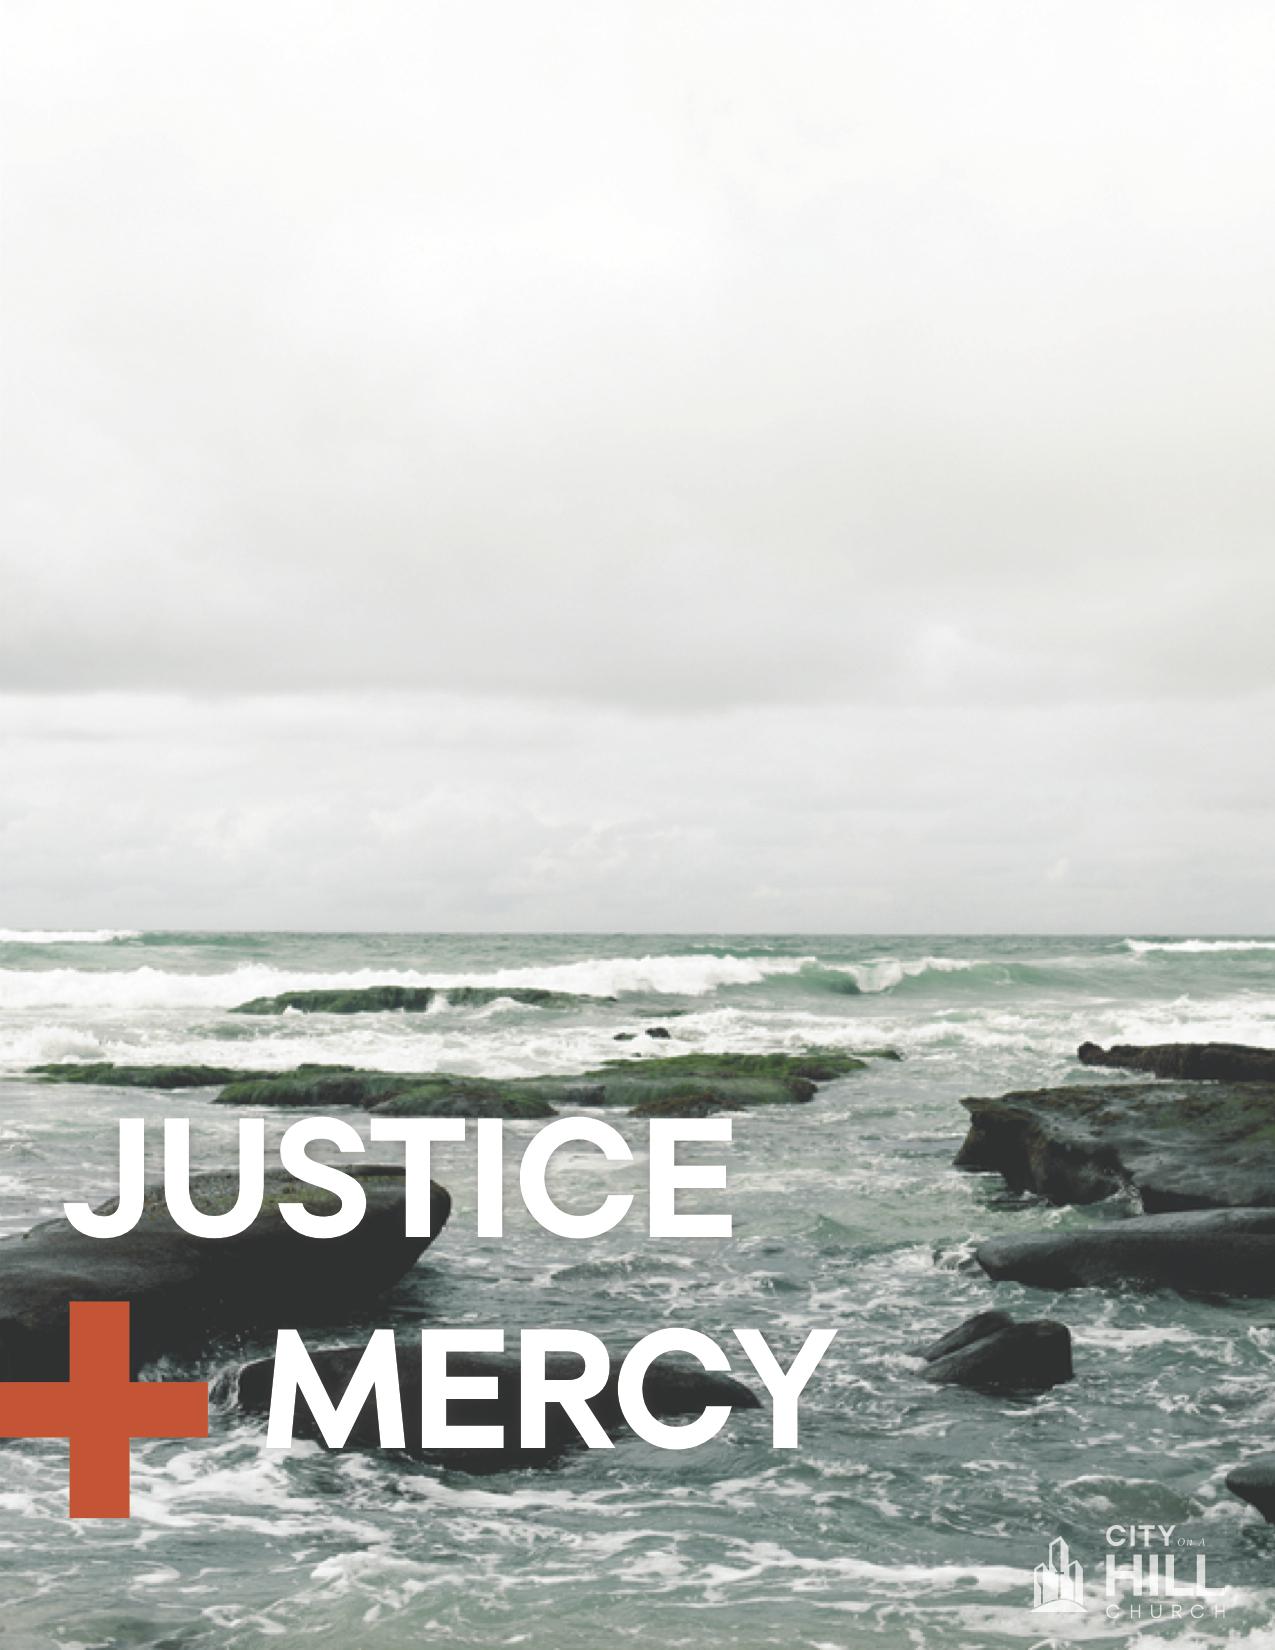 Justice_Mercy_by_CoaH.jpg